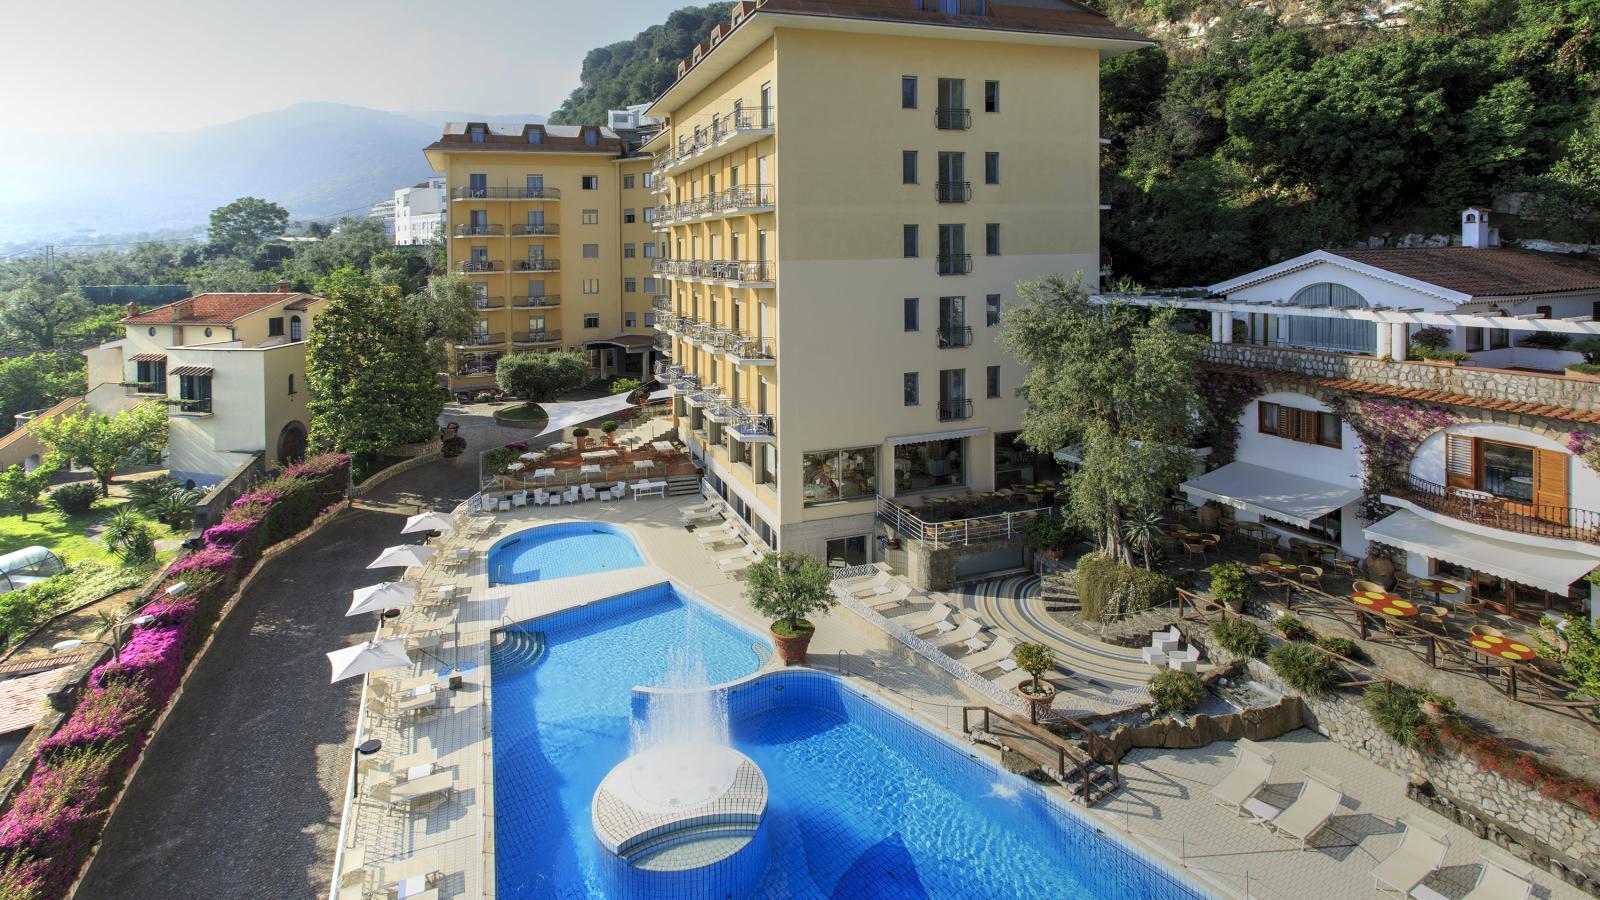 Hotel Conca Park Sorrento